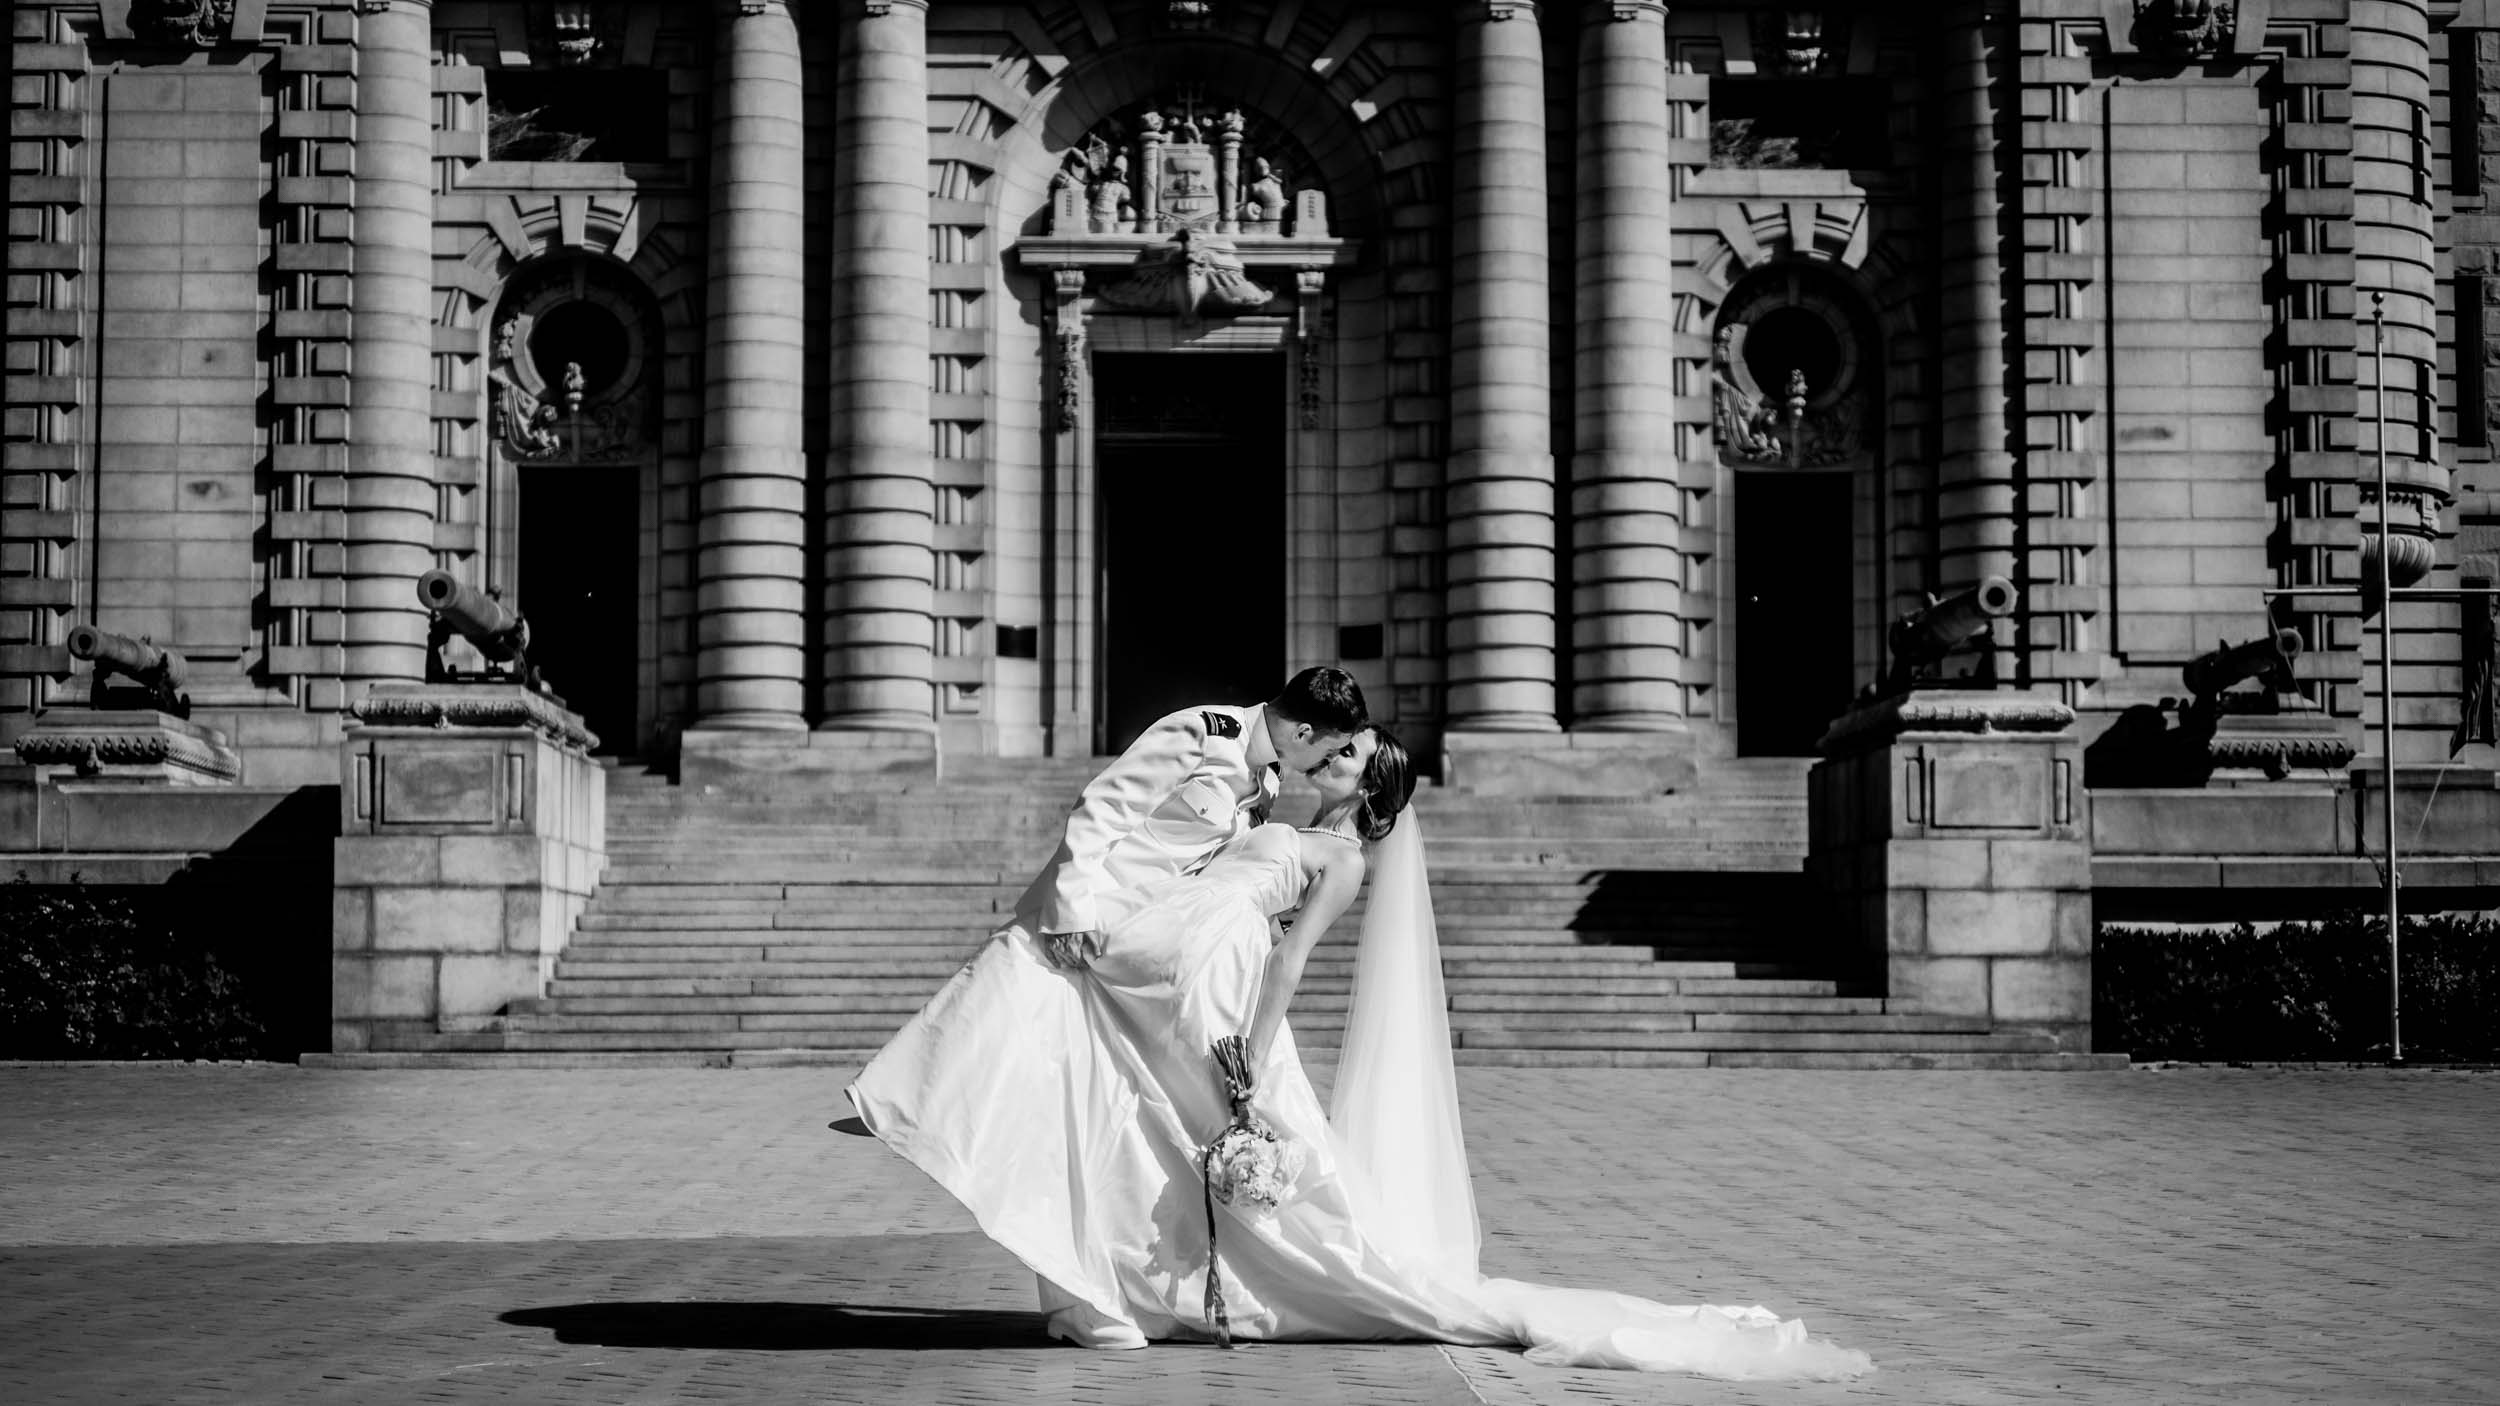 dc+metro+wedding+photographer+vadym+guliuk+photography+wedding+bride+and+groom-2055.jpg